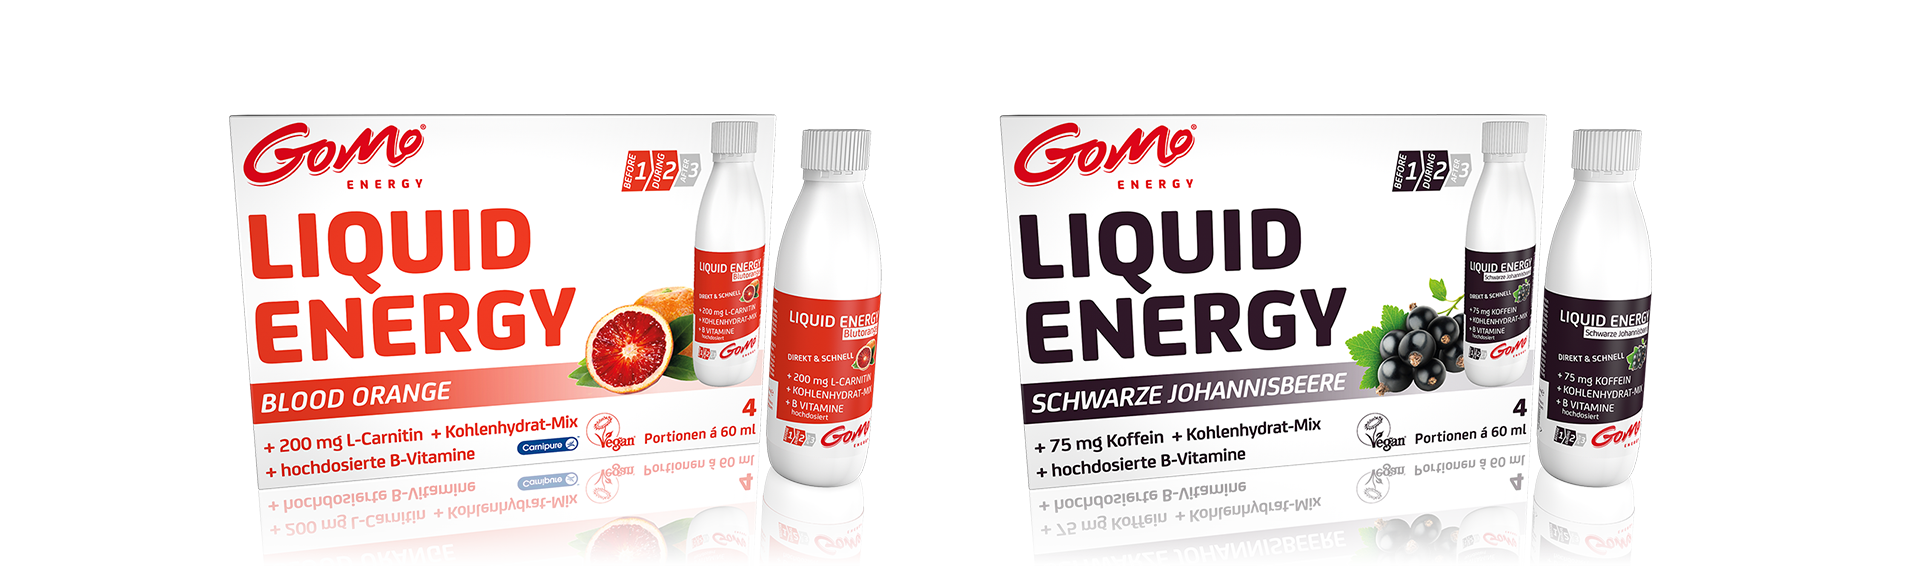 GoMo ENERGY Sports drink energy shot caffeine high doses vitamin b zinc magnesium L-CARNETIN